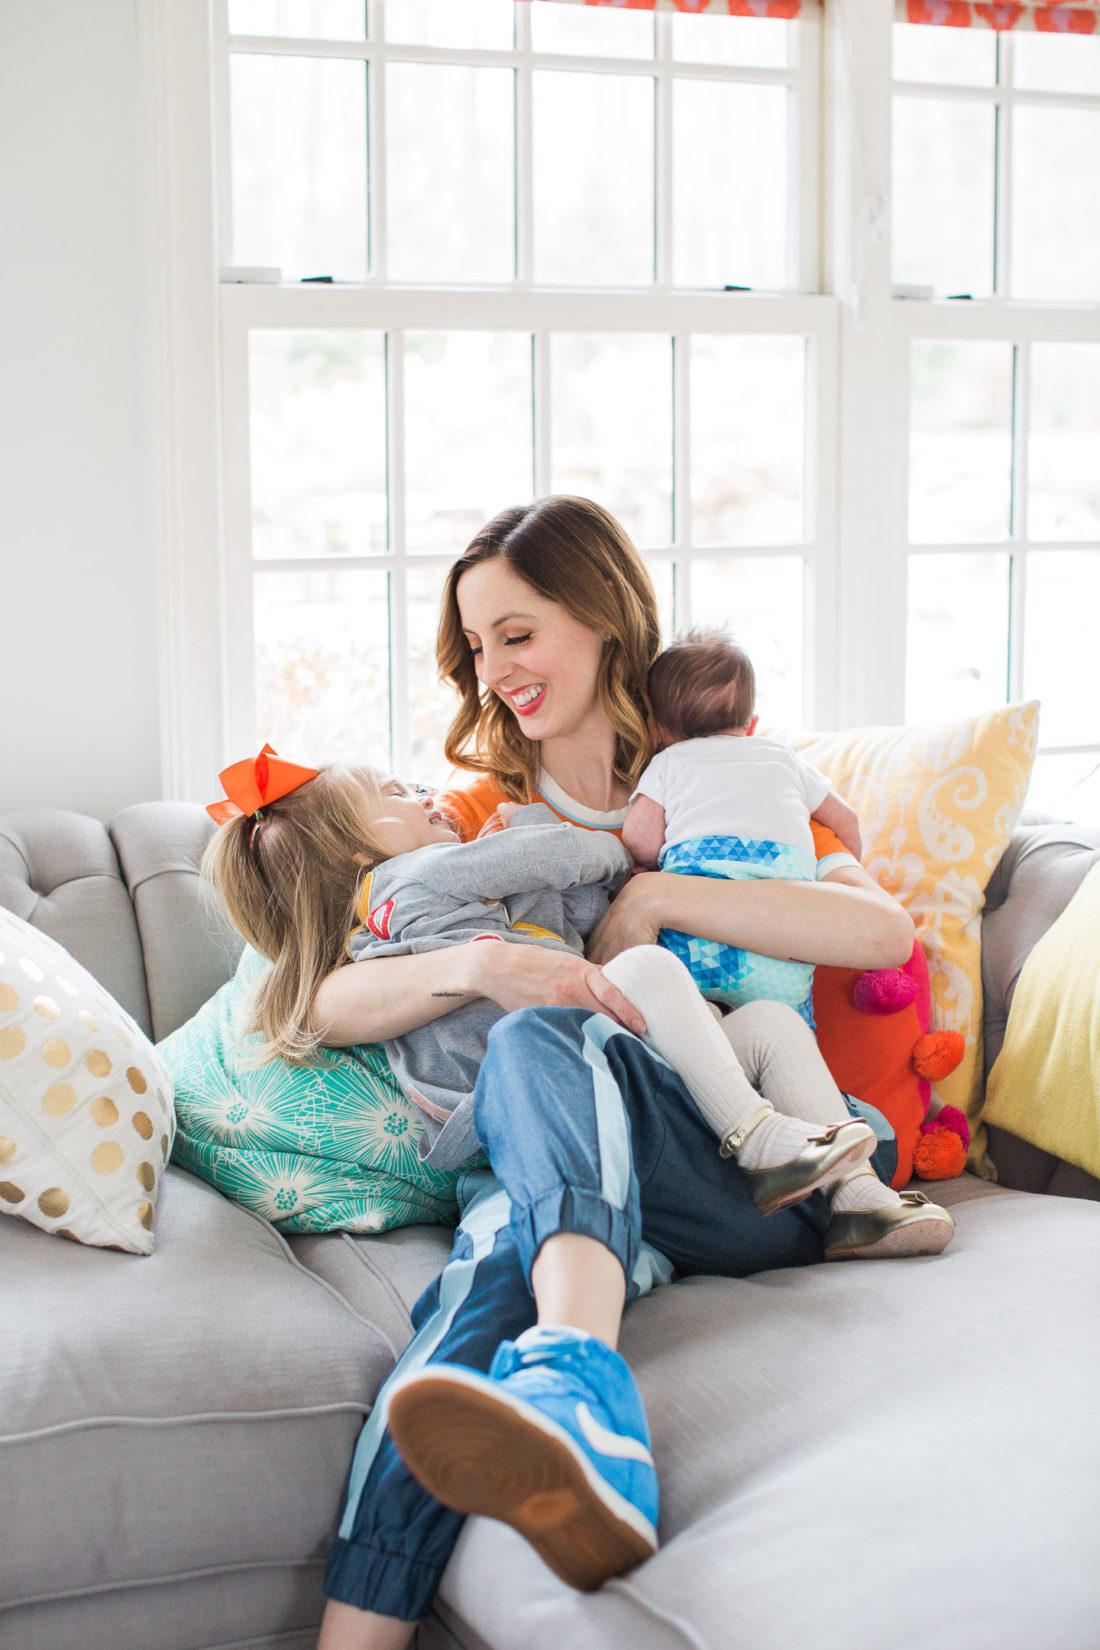 bd822f793f0 Eva Amurri Martino of lifestyle and motherhood blog Happily Eva After